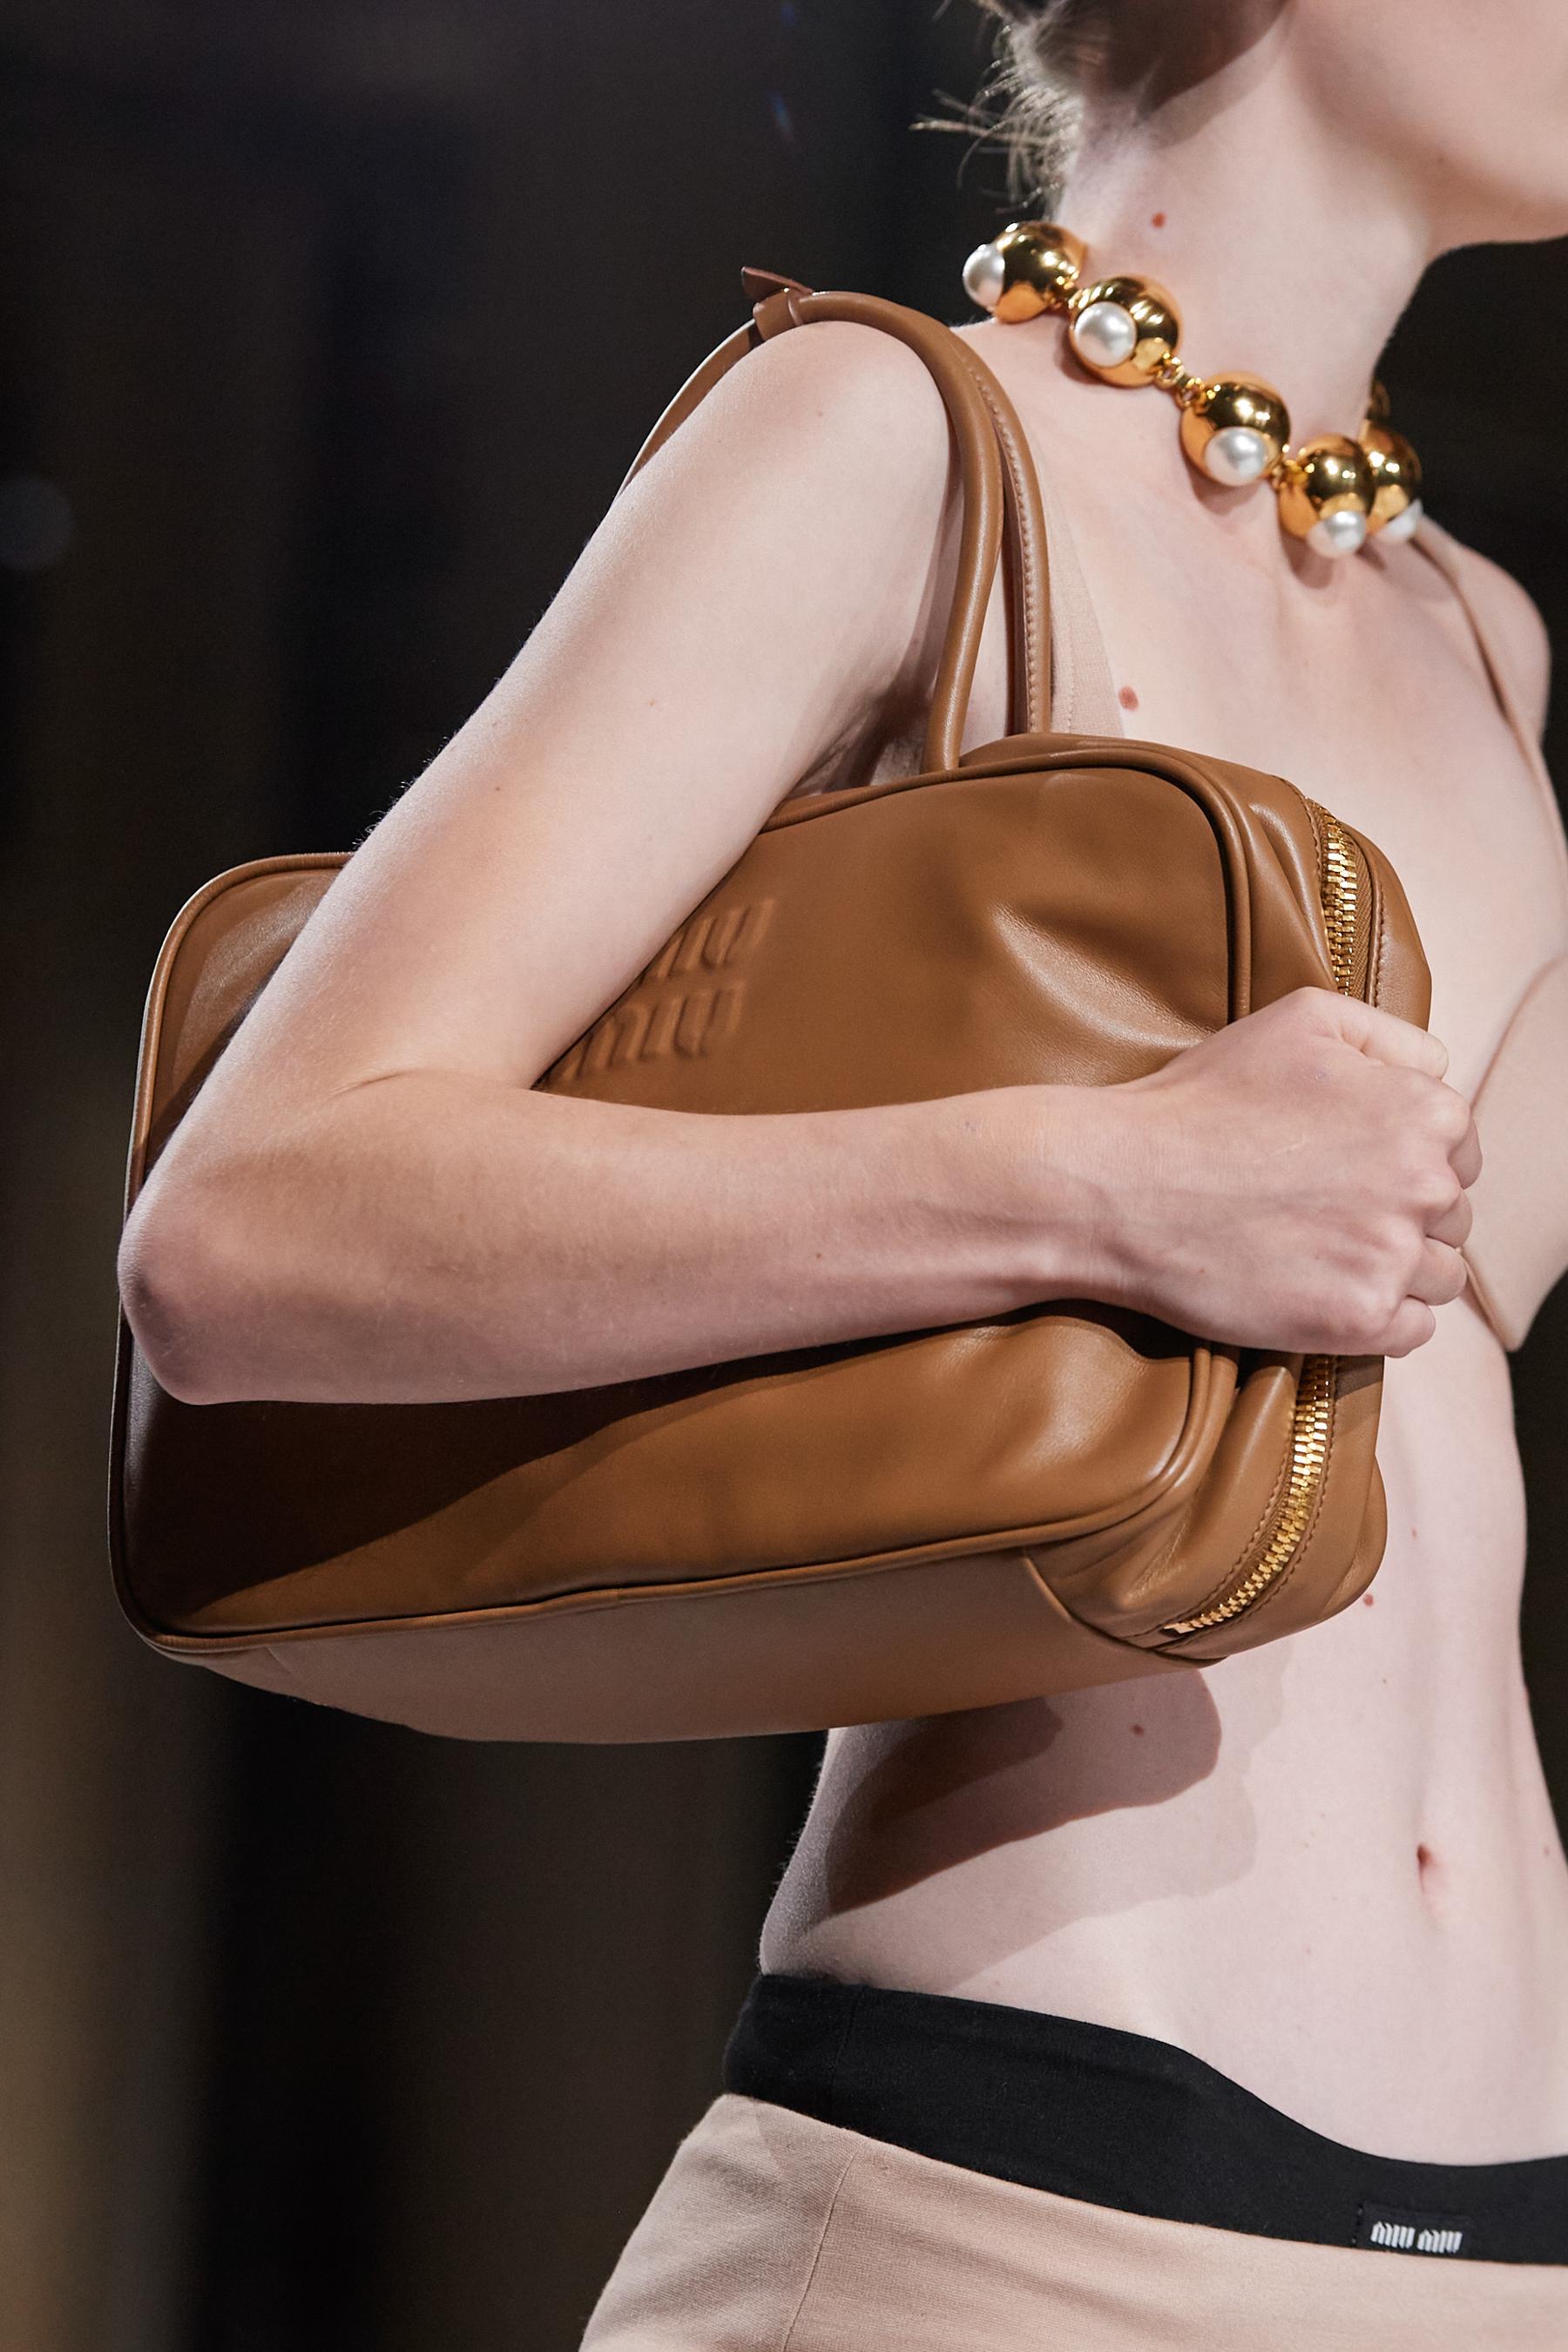 Miu Miu Spring 2022 Details Fashion Show